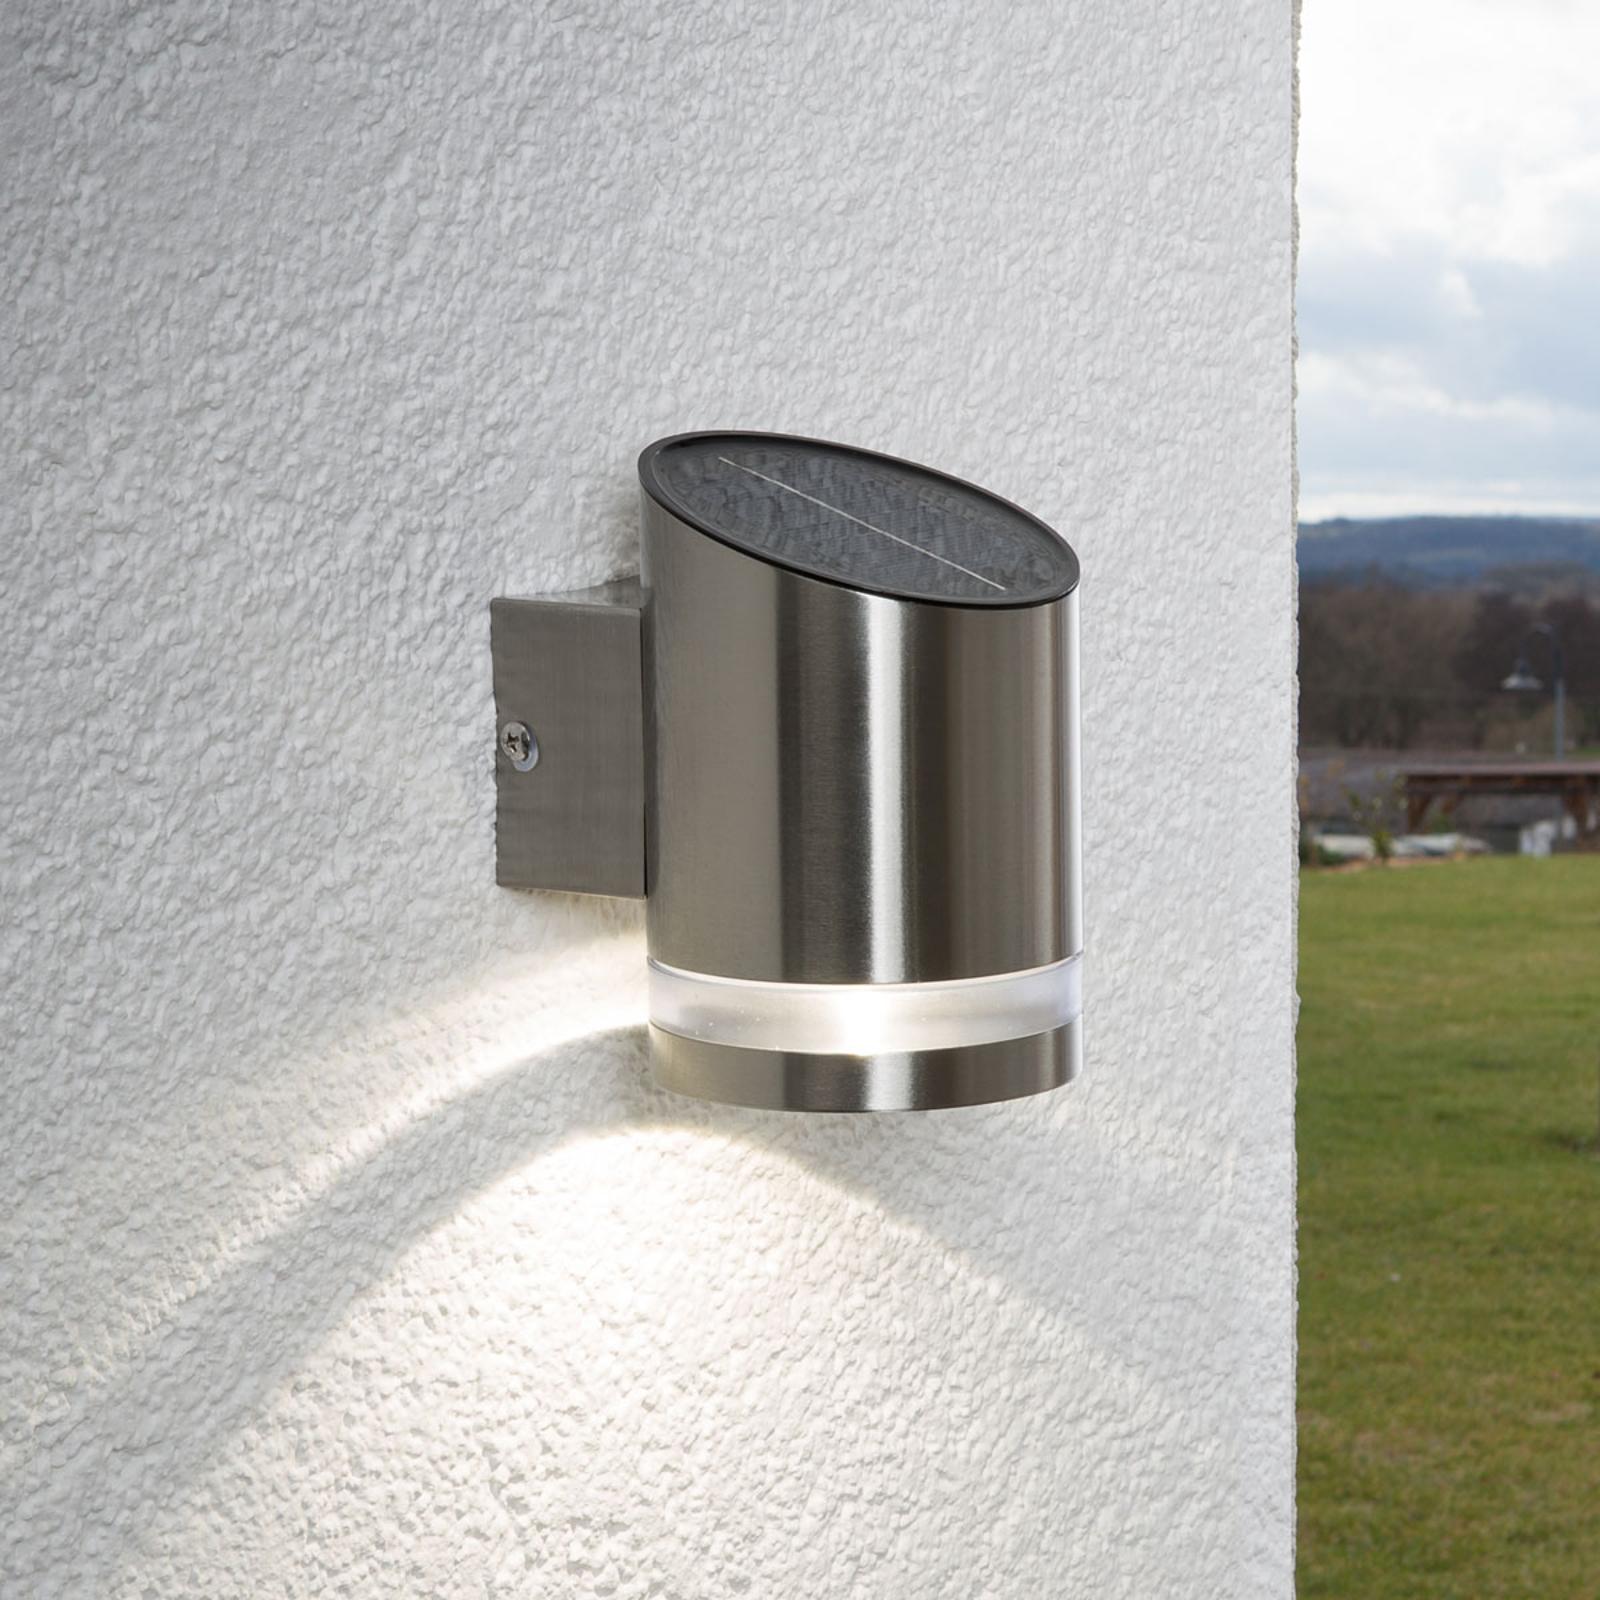 LED-solcellelampe Salma til anbringelse på muren